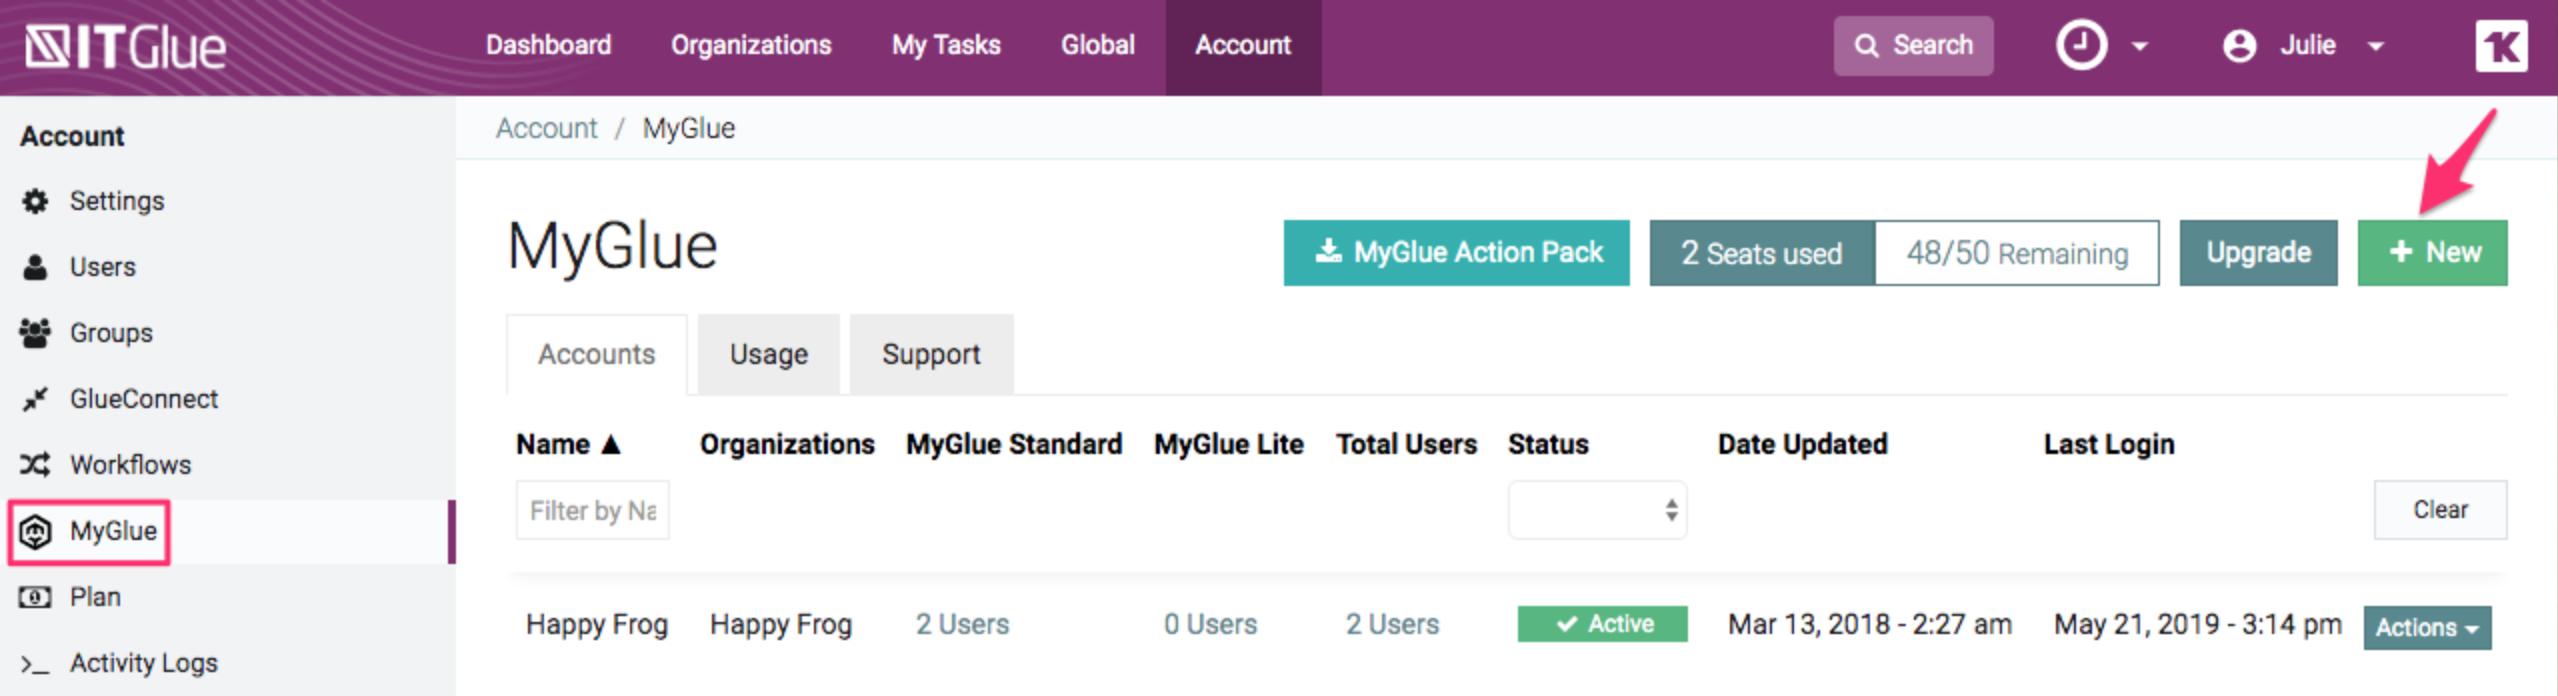 MyGlue___IT_Glue_png__1280_349_.png